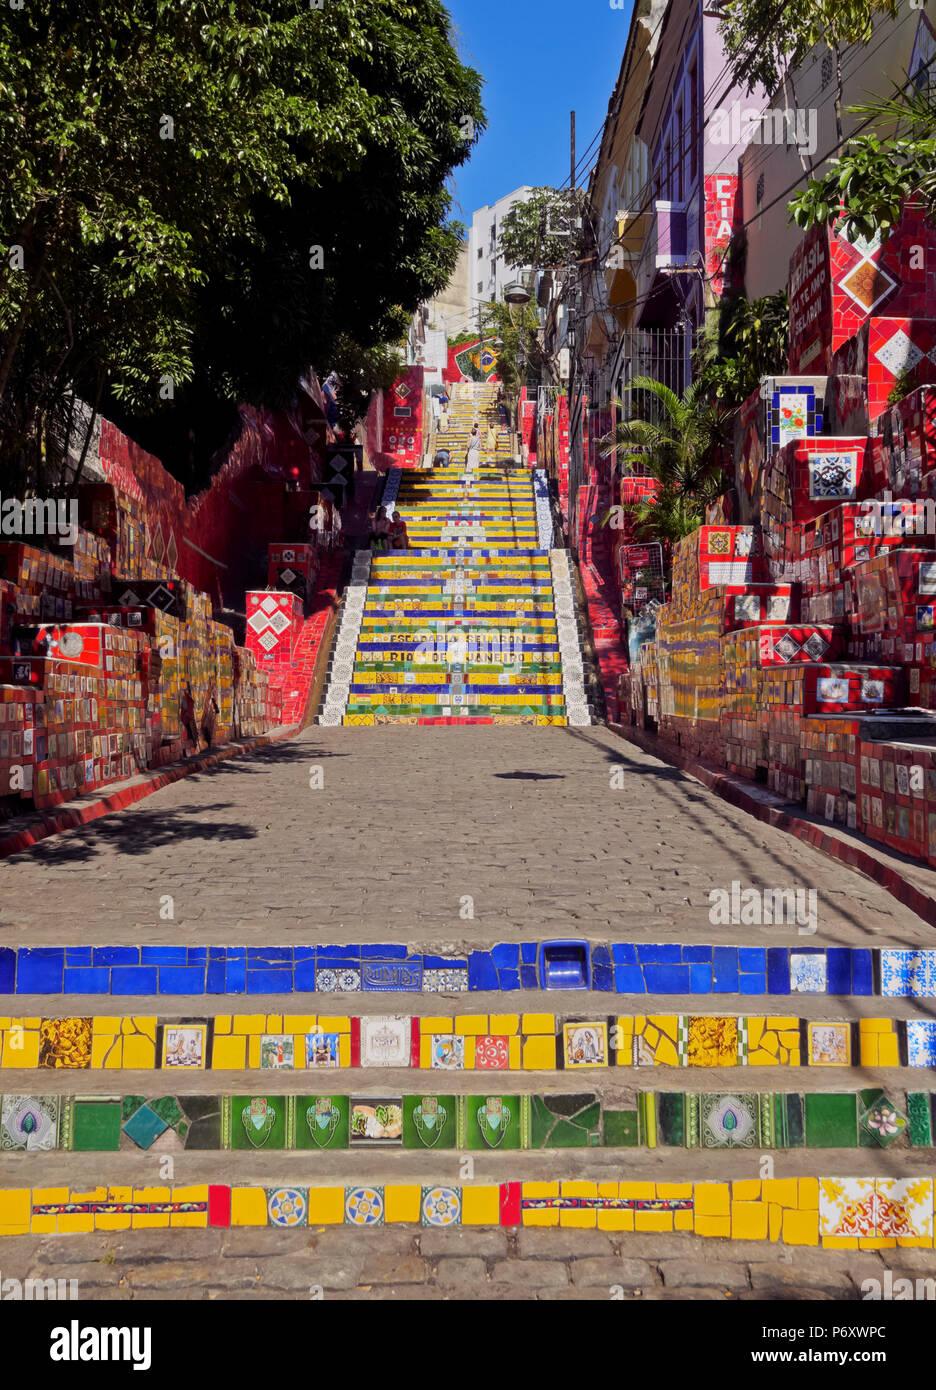 Brazil, City of Rio de Janeiro, View of the Selaron Steps connecting Lapa and Santa Teresa Neighbourhoods. - Stock Image